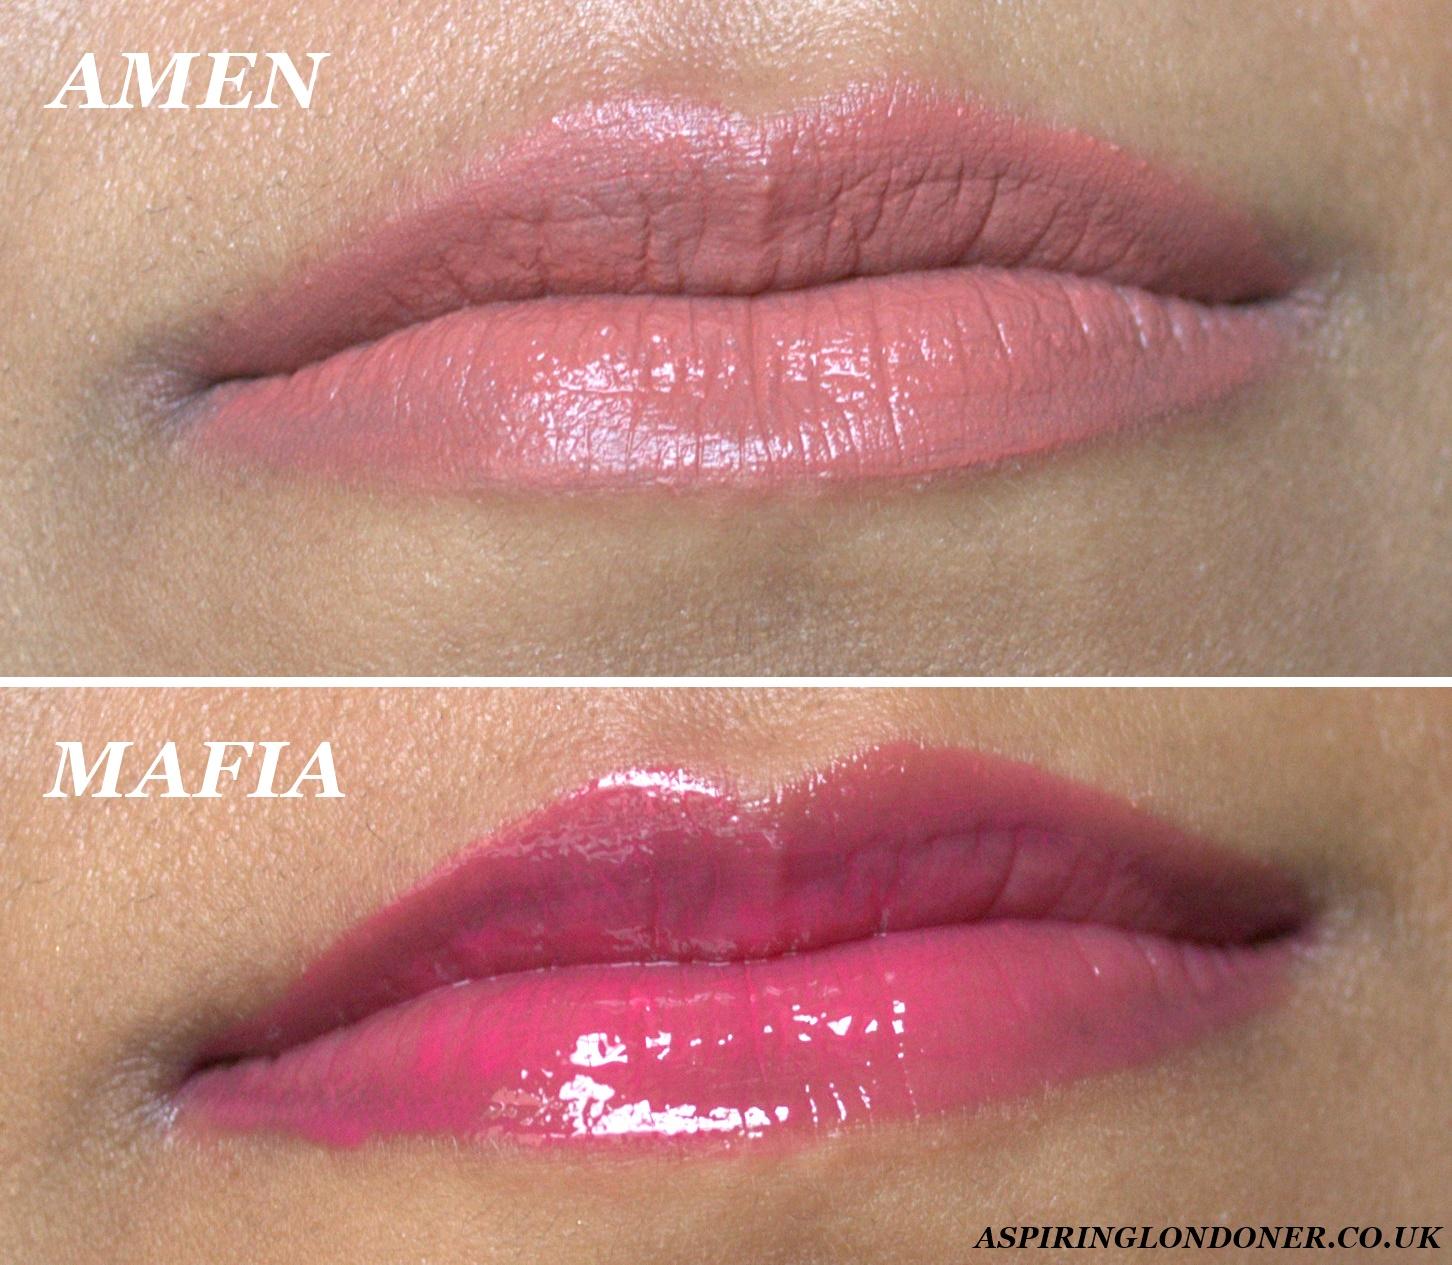 L'Oreal Paris Infallible Mega Gloss Lip Swatches Amen Mafia - Aspiring Londoner